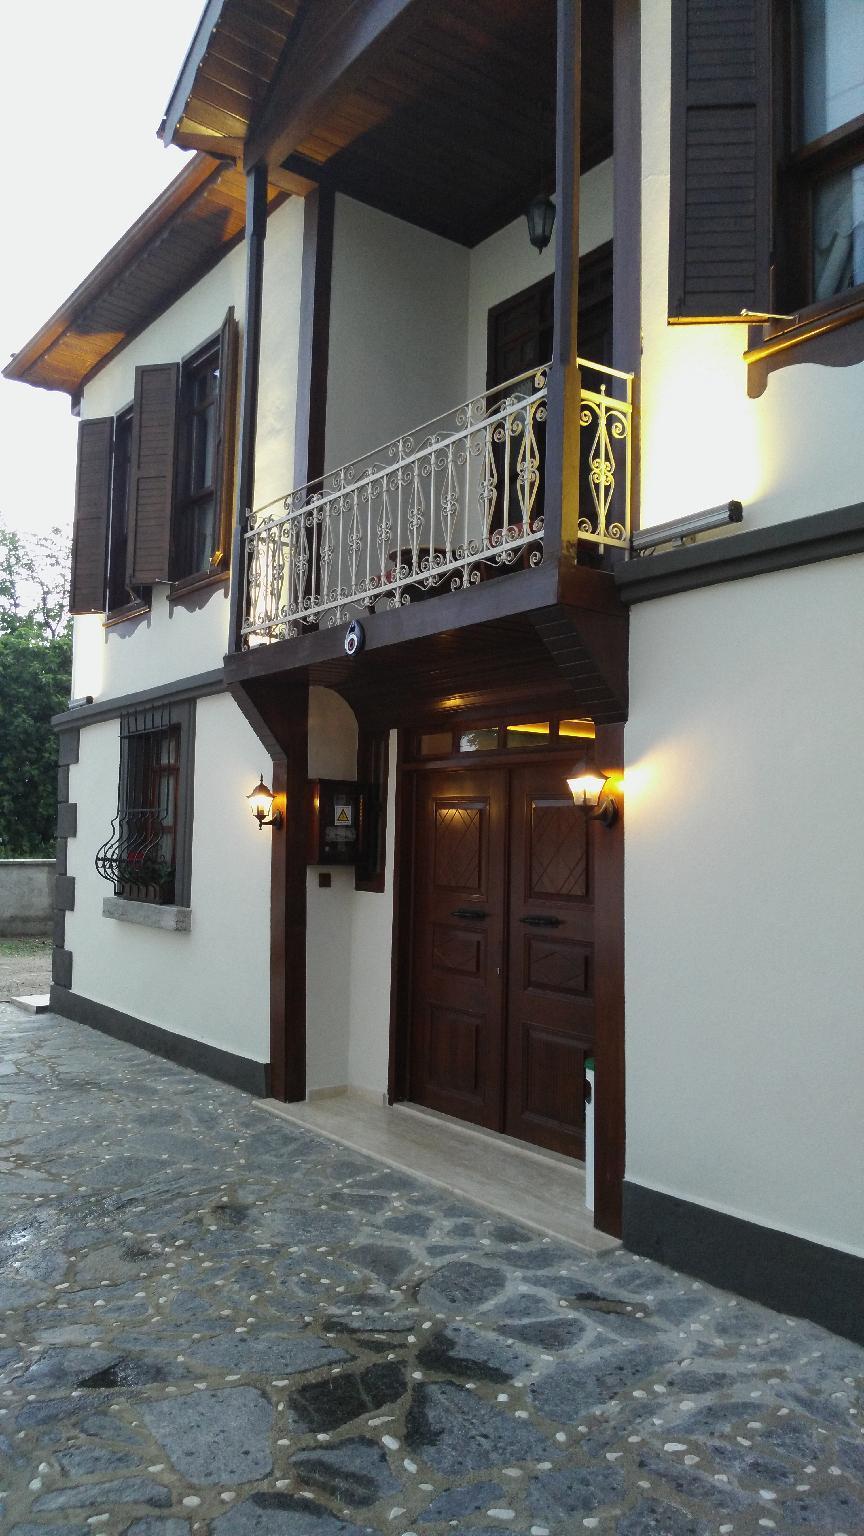 Aslibey Konagi Butik Otel, Sapanca